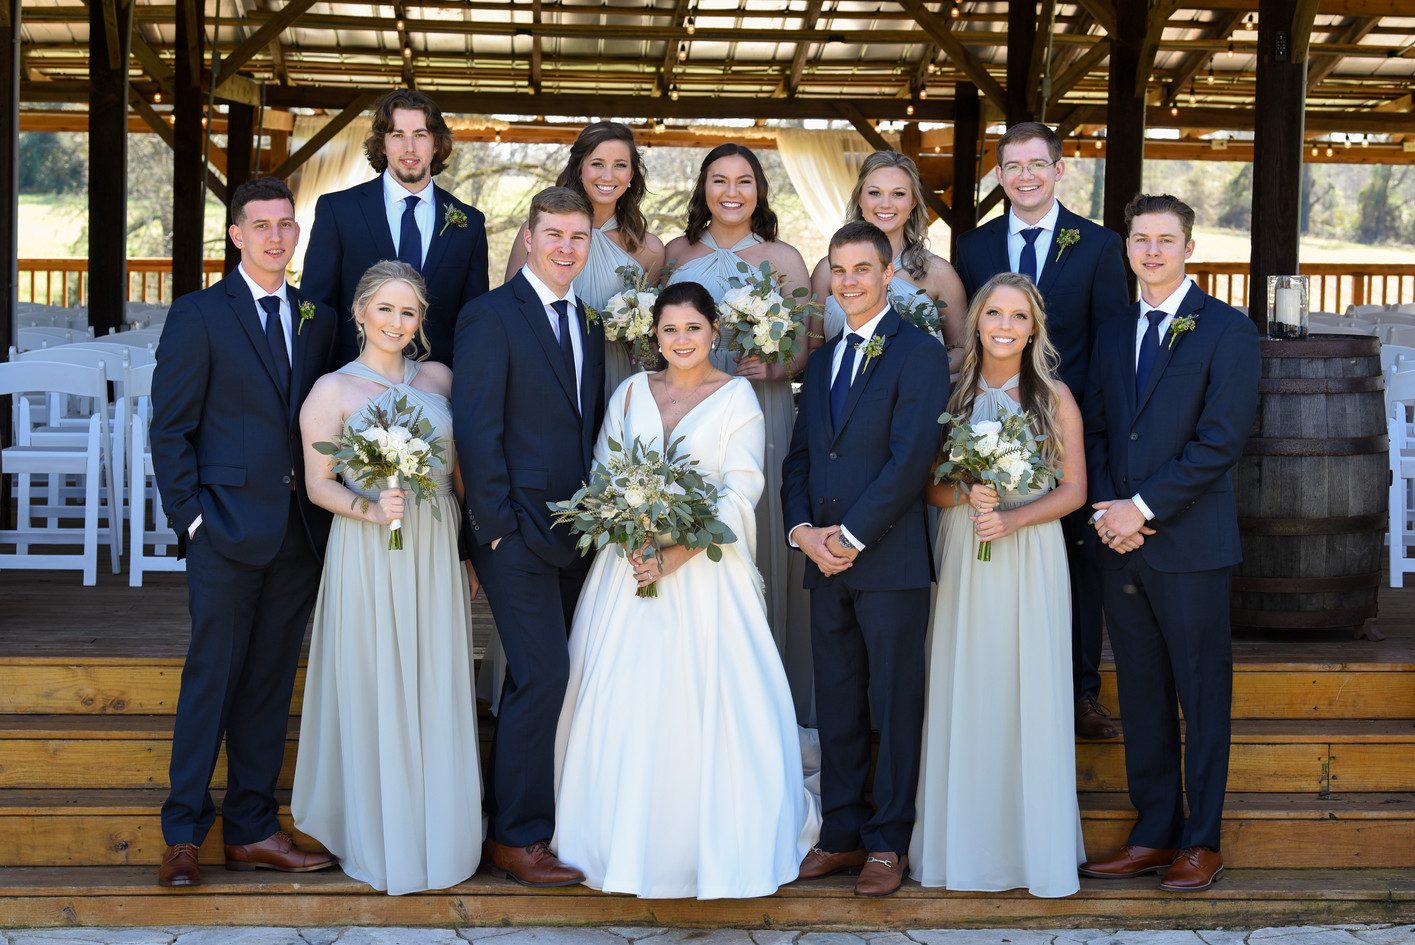 Wedding party on pole barn steps